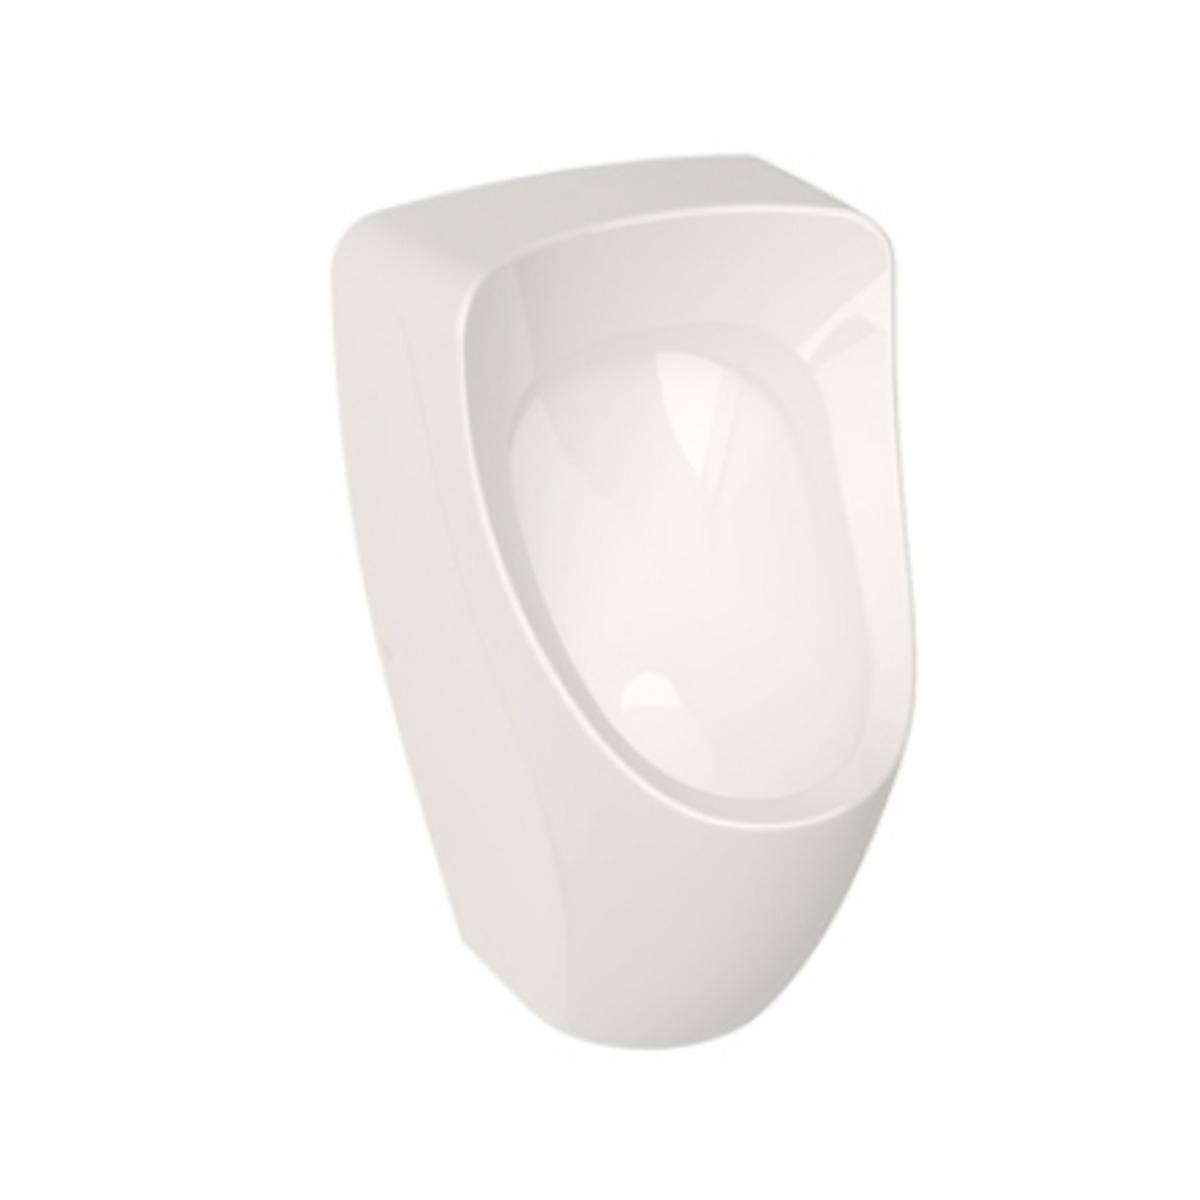 Plieger Kansas urinoir glans wit